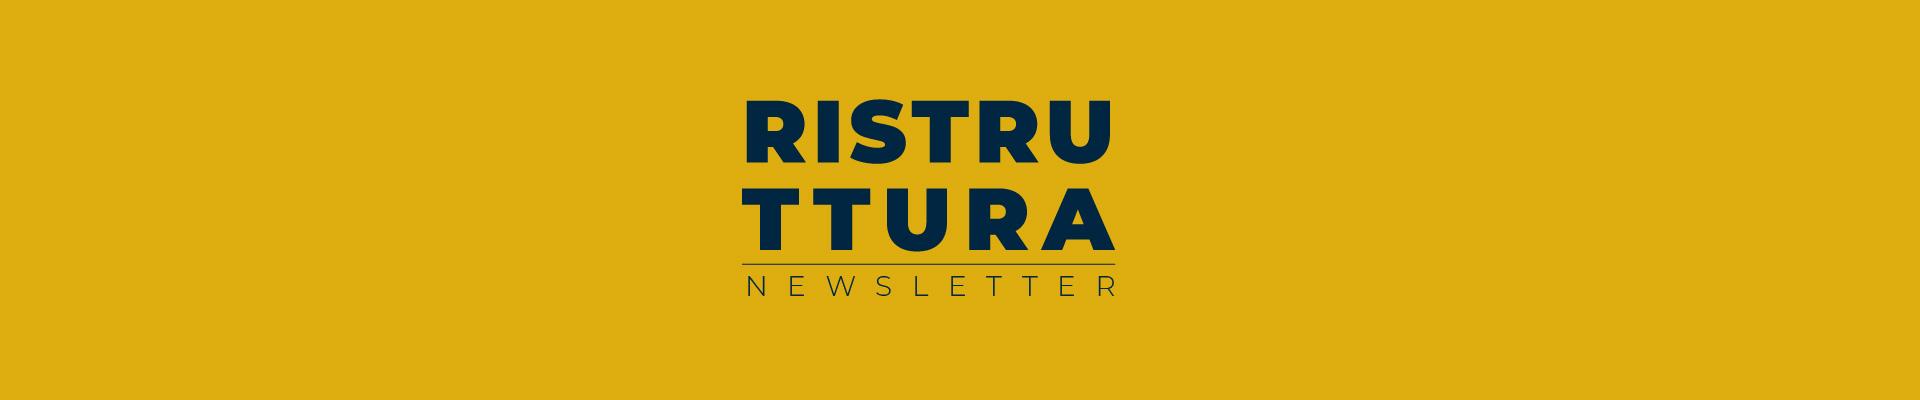 header-ristruttura-newsletter-garbi-h400